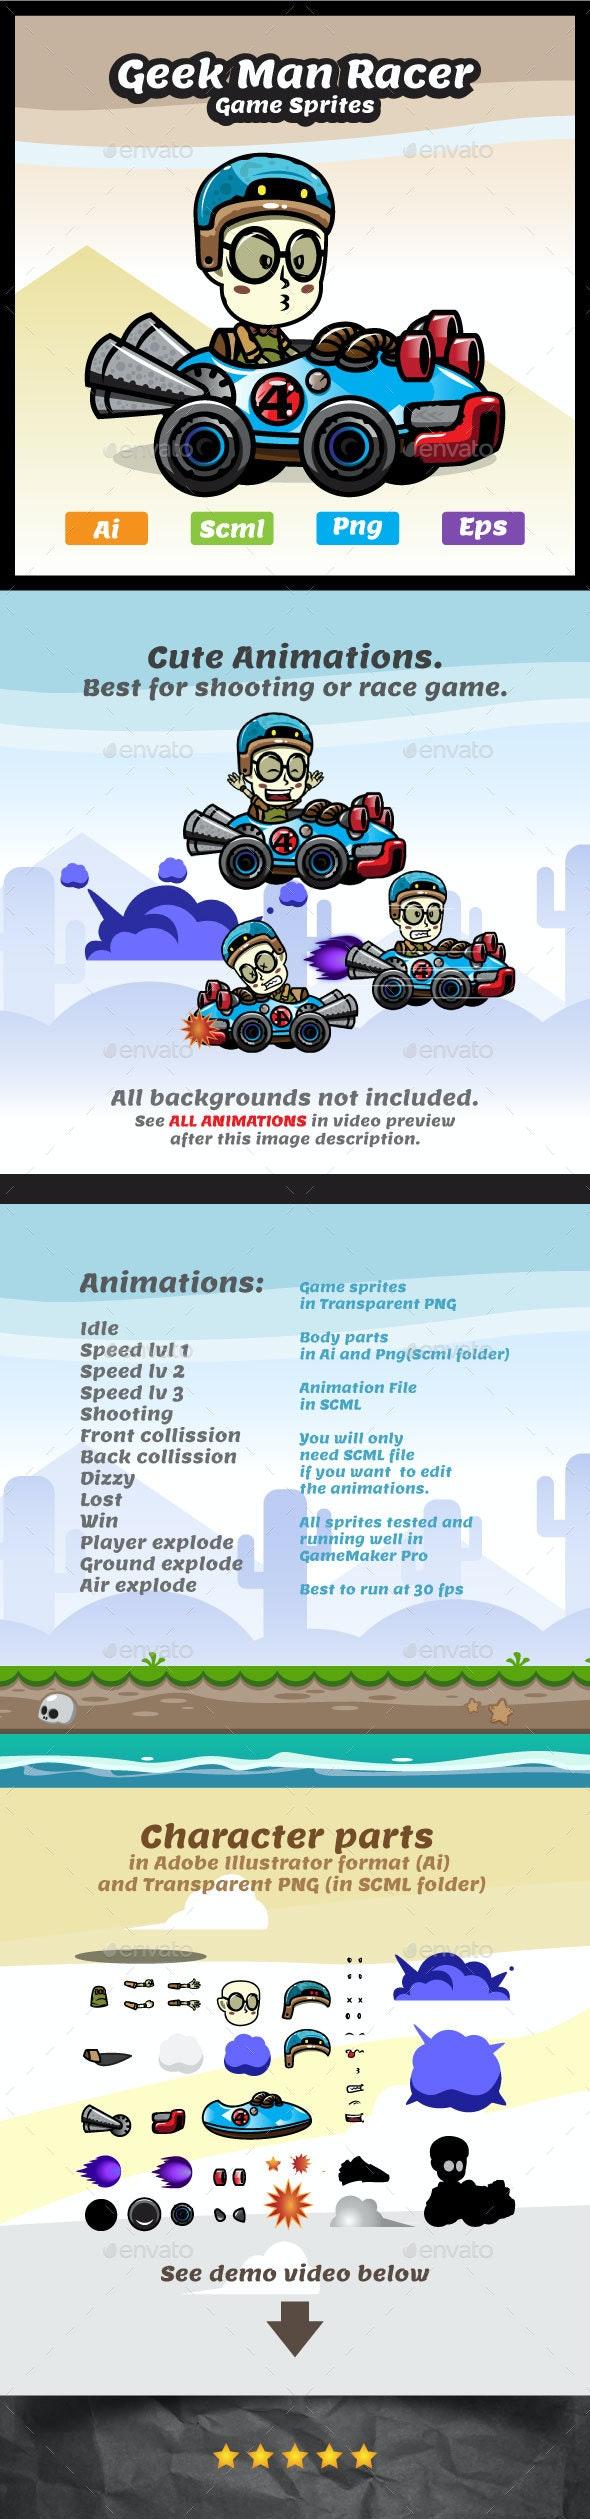 Game Character - Geek Racer Boy Sprites - Sprites Game Assets